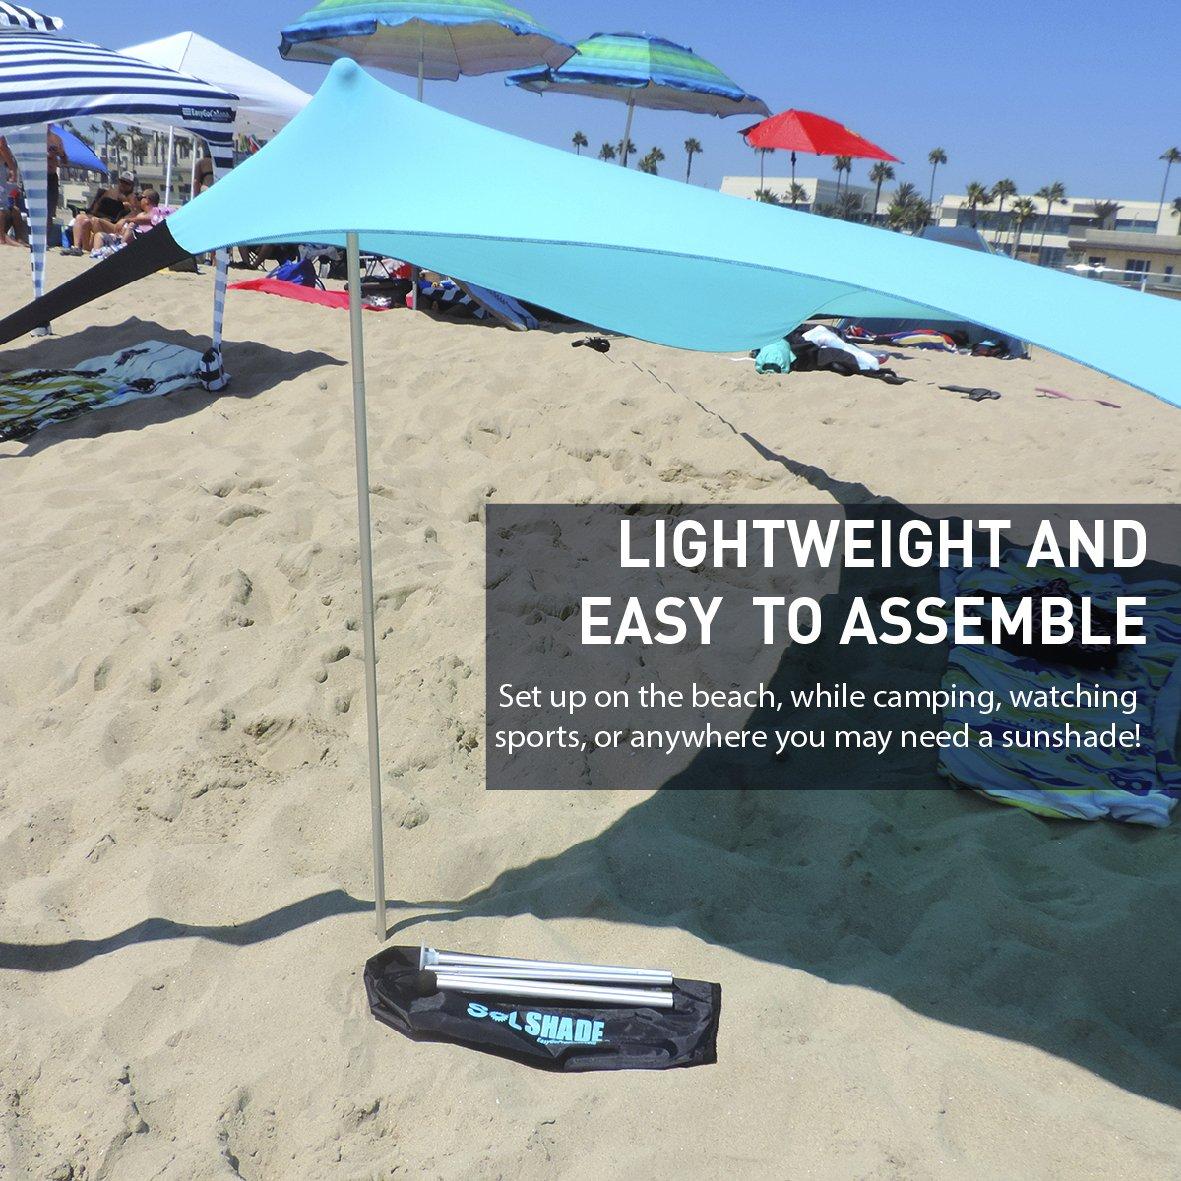 Amazon.com Sol ShadeTM Portable Easy Pop Up Beach Stretch Fabric Sun Shade Tent Canopy Home u0026 Kitchen  sc 1 st  Amazon.com & Amazon.com: Sol ShadeTM Portable Easy Pop Up Beach Stretch Fabric ...